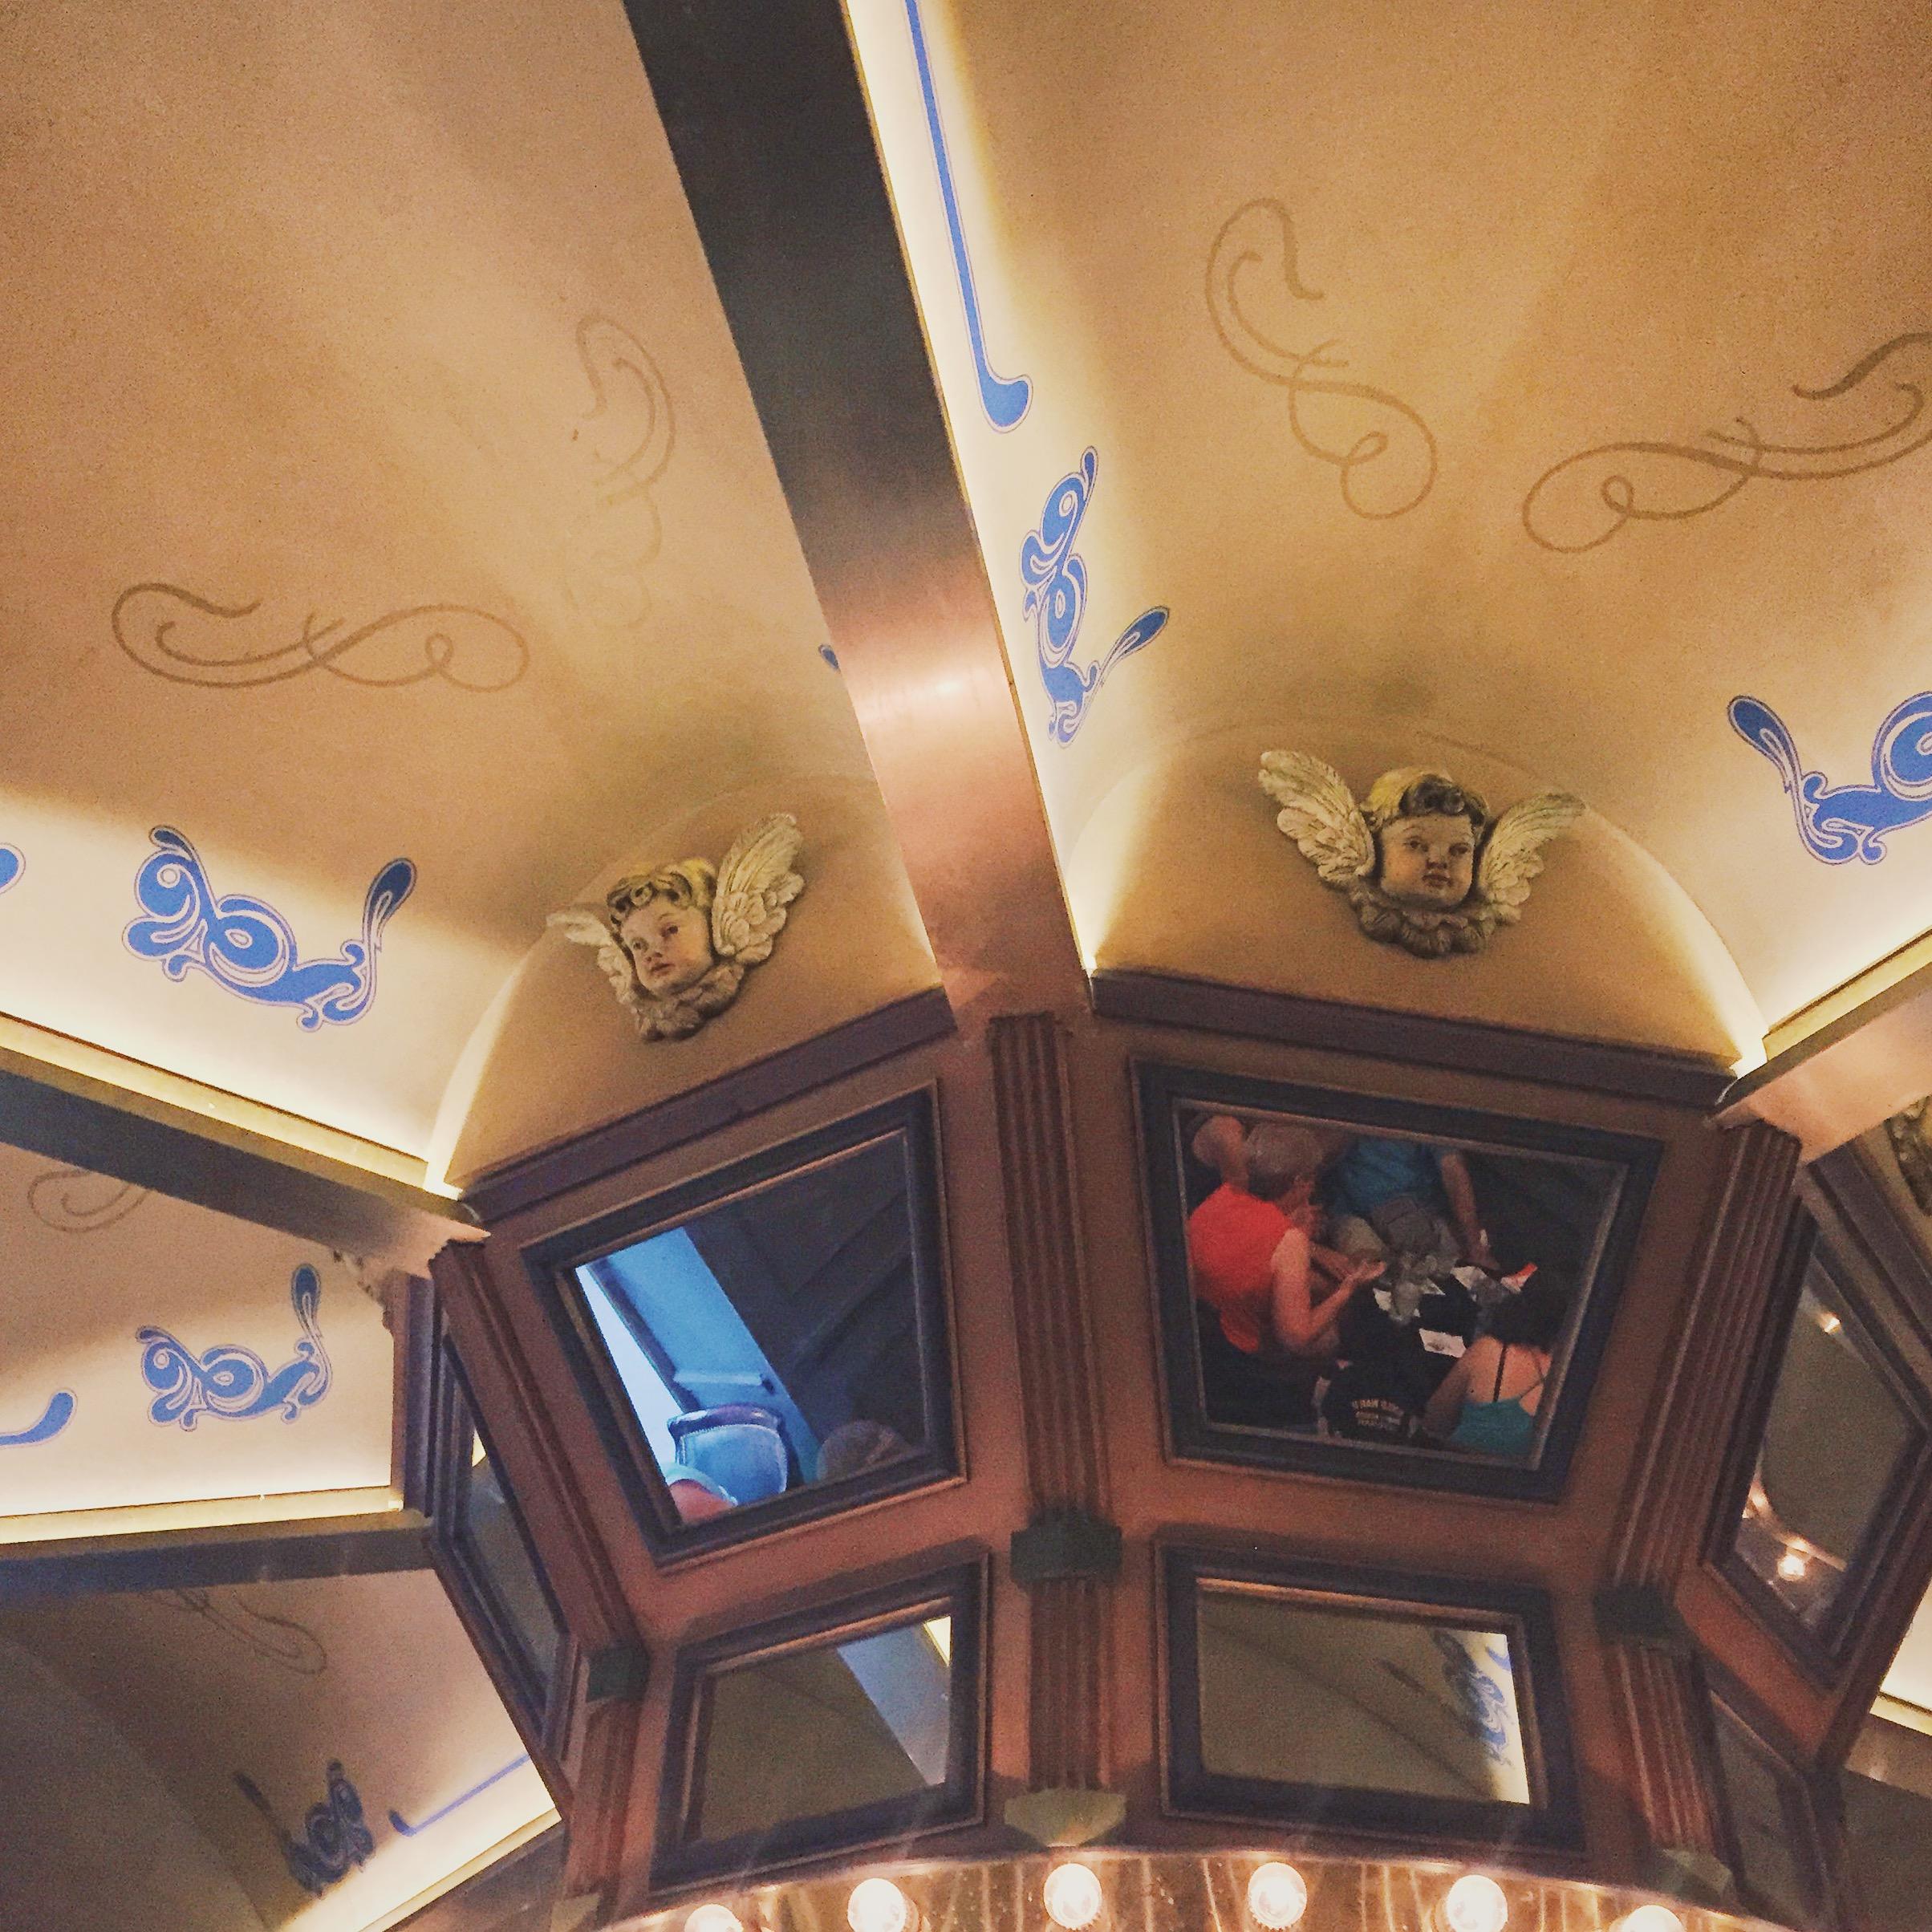 Carousel Bar, Hotel Monteleone, New Orleans, La